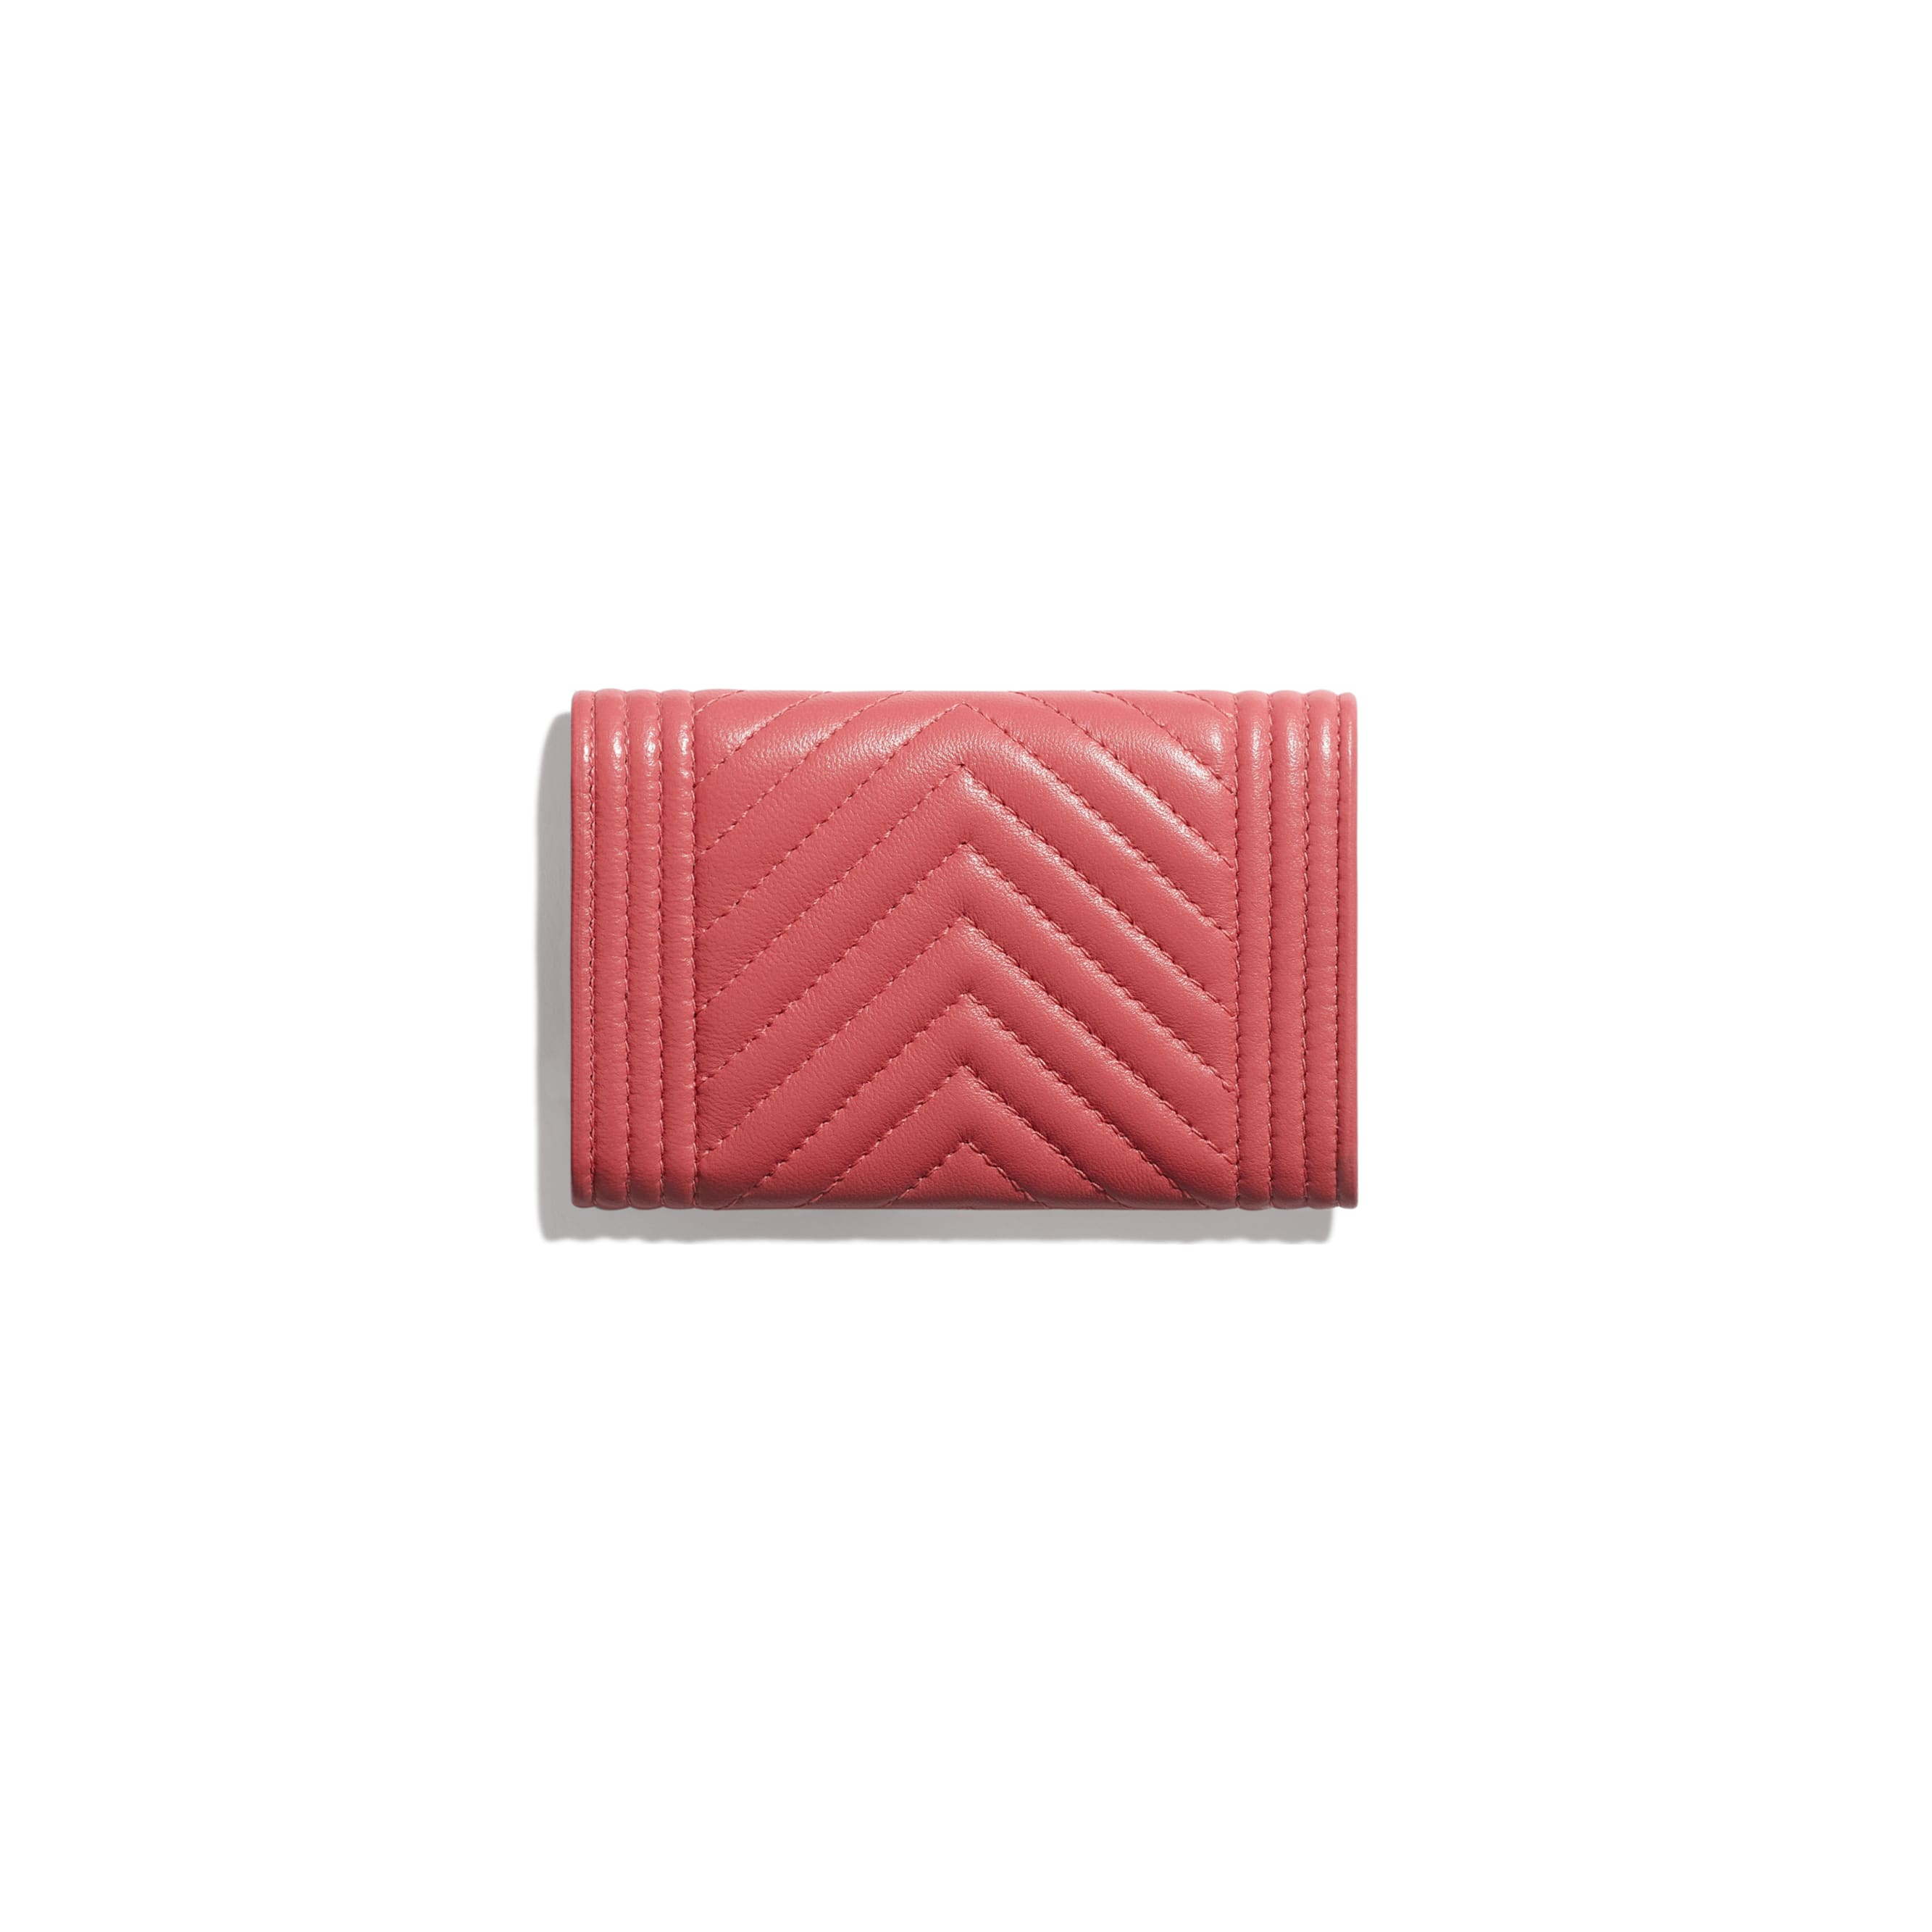 BOY CHANEL Flap Card Holder - Pink - Lambskin - CHANEL - Alternative view - see standard sized version